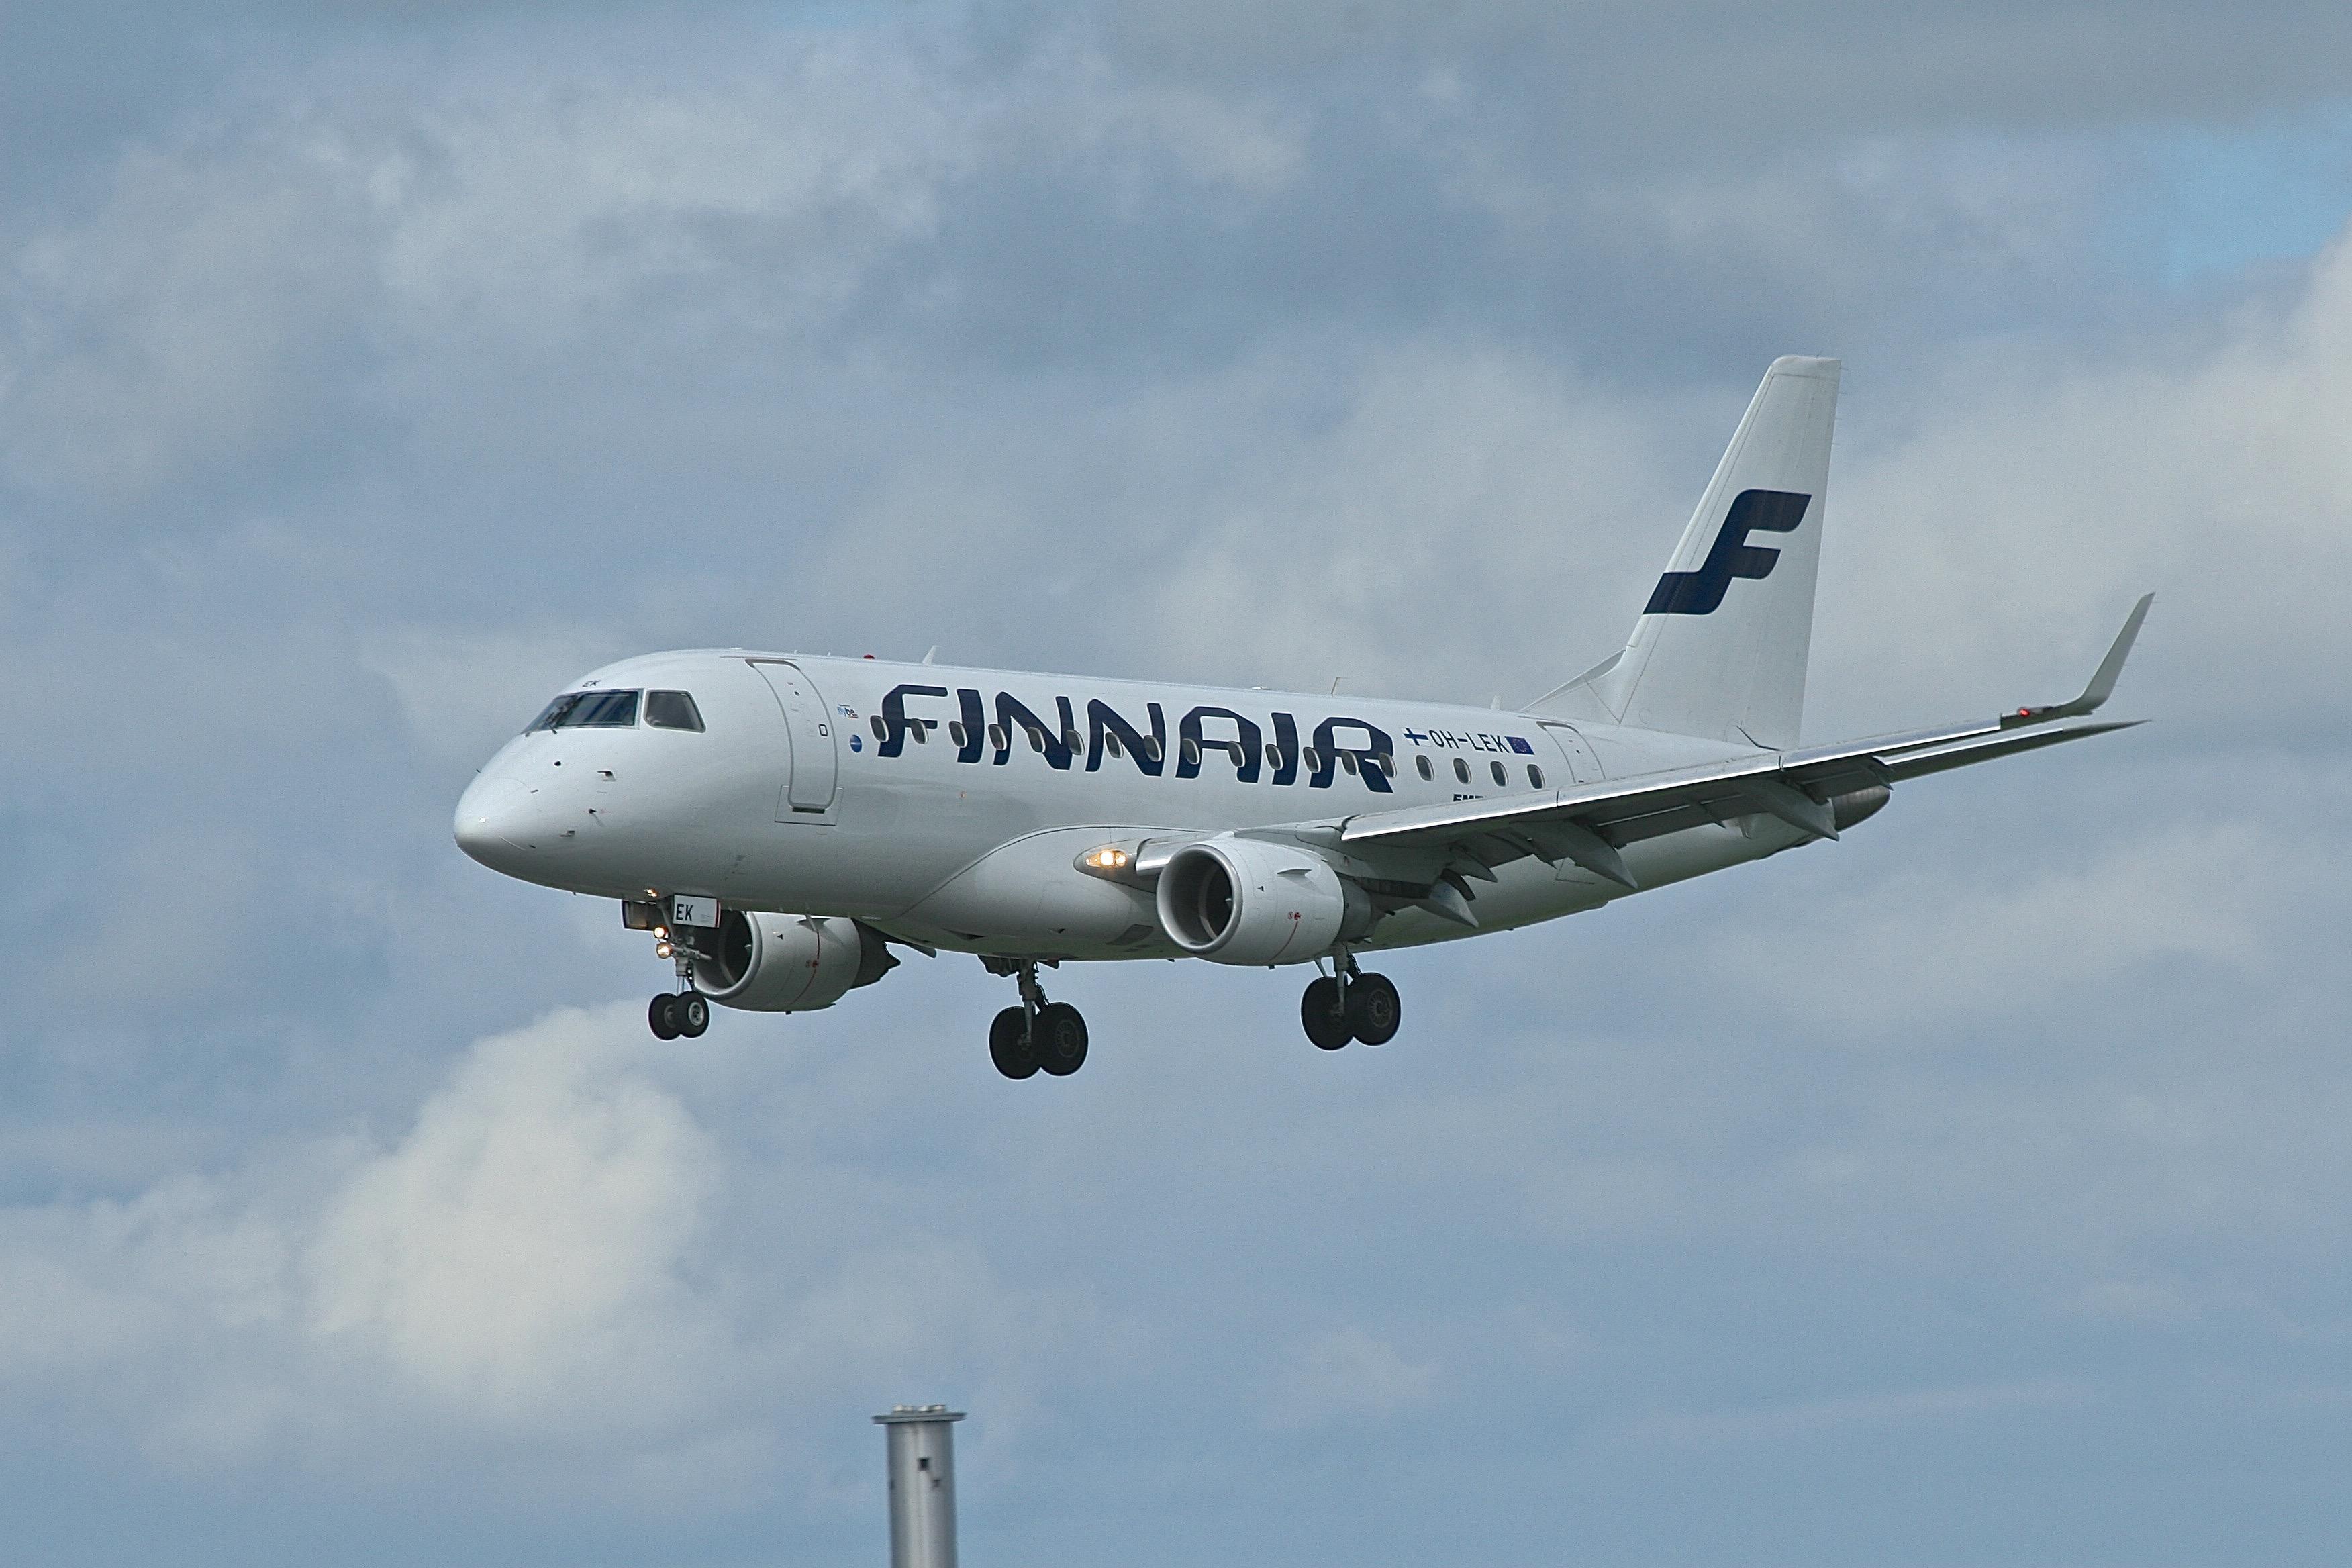 Finnari